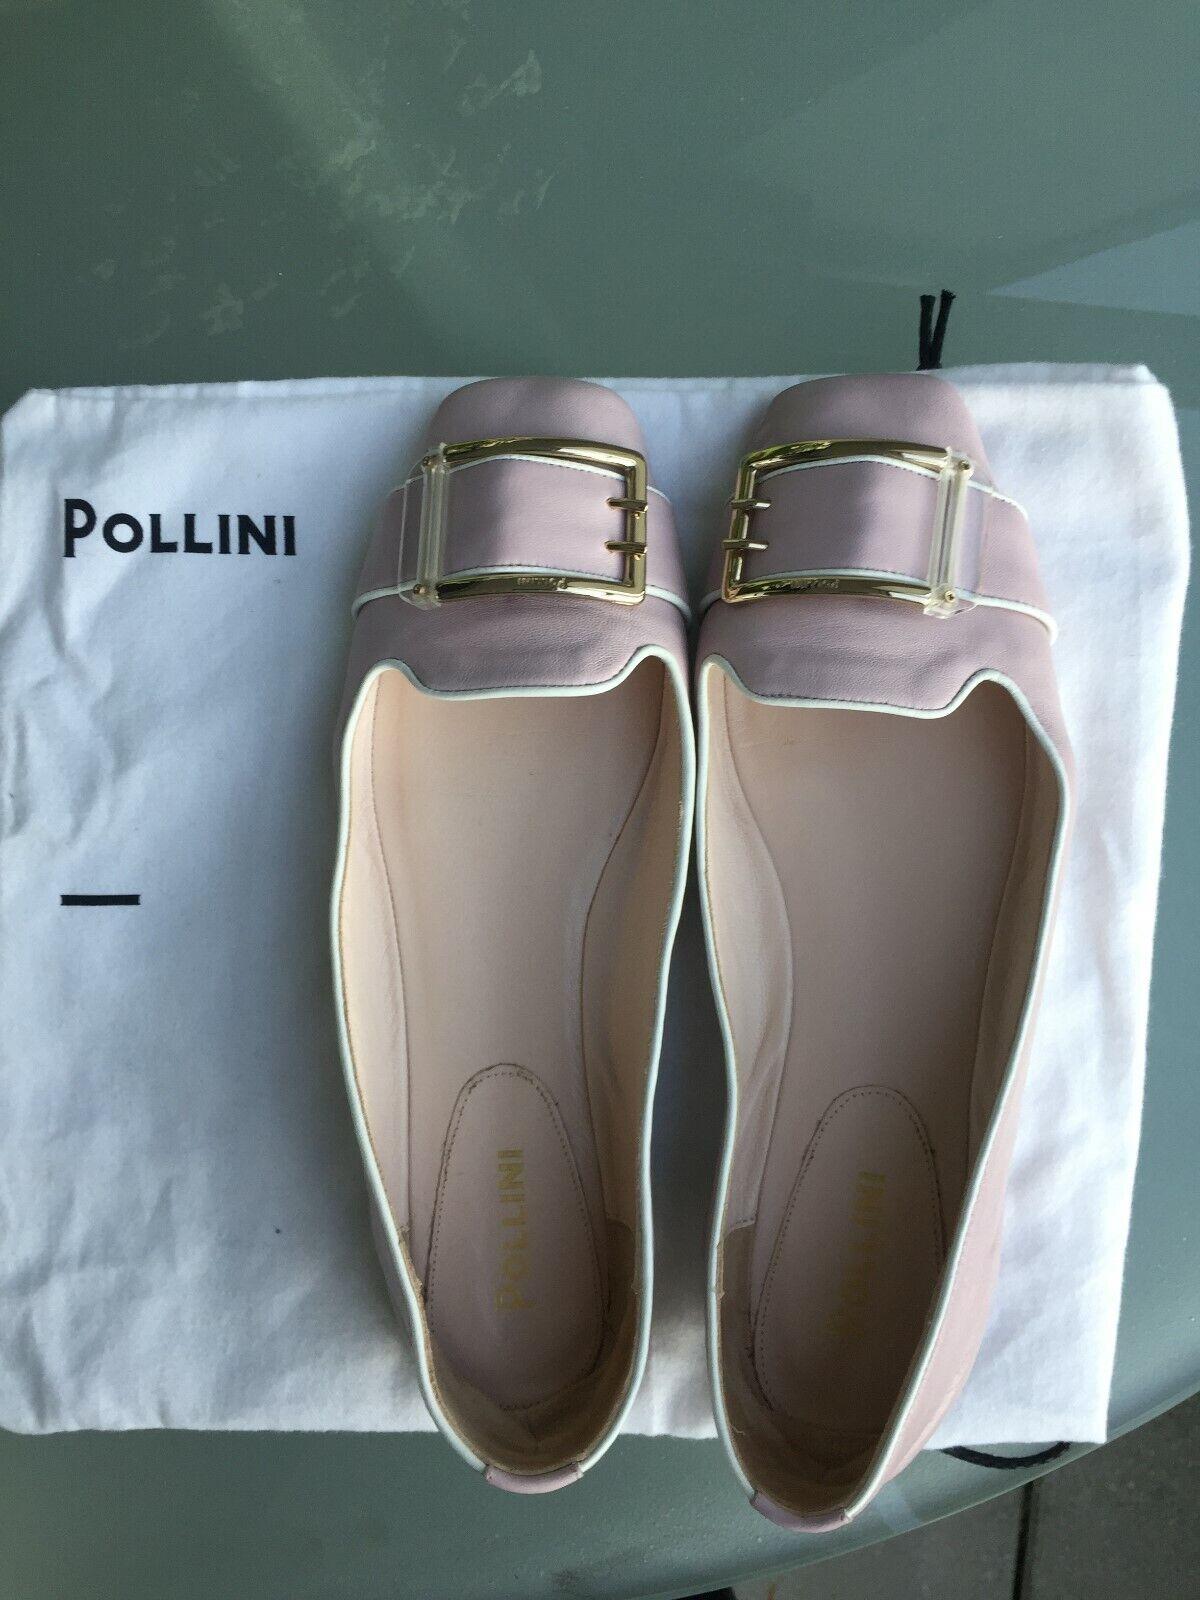 Damenschuhe Orignal Pollini , Ballerina,Rosa Kalbleder, Spange,Gr. 40,neuwertig